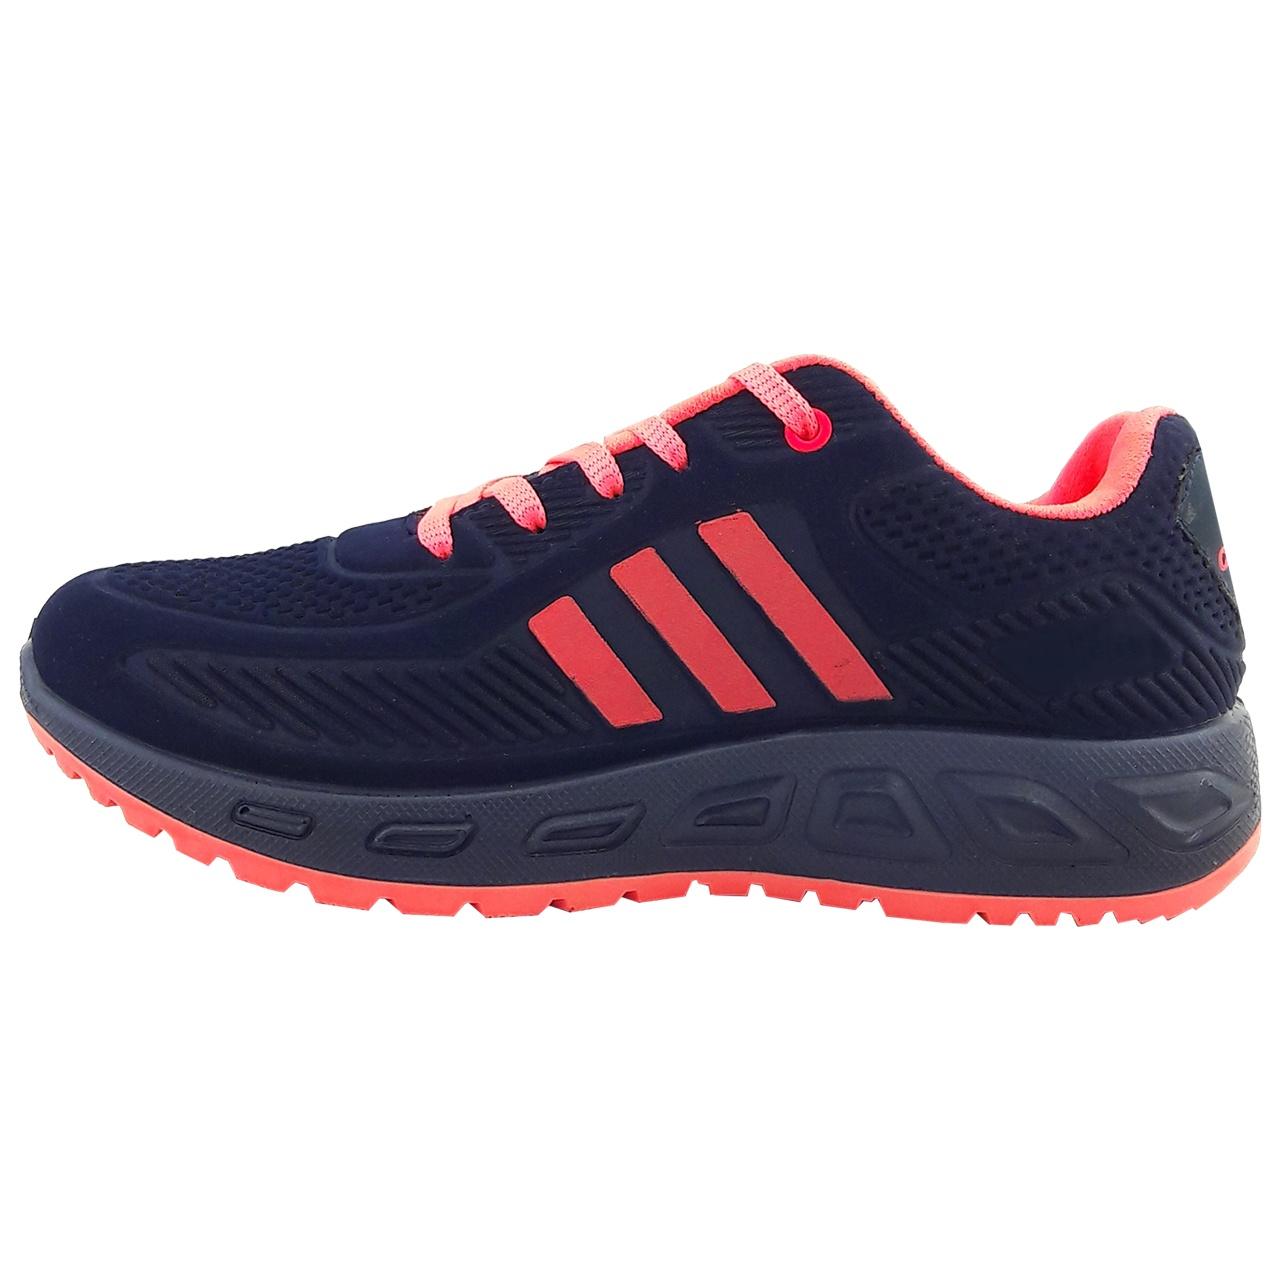 کفش مخصوص پیاده روی زنانه سورنا مدل 3kh.nvy.rd001